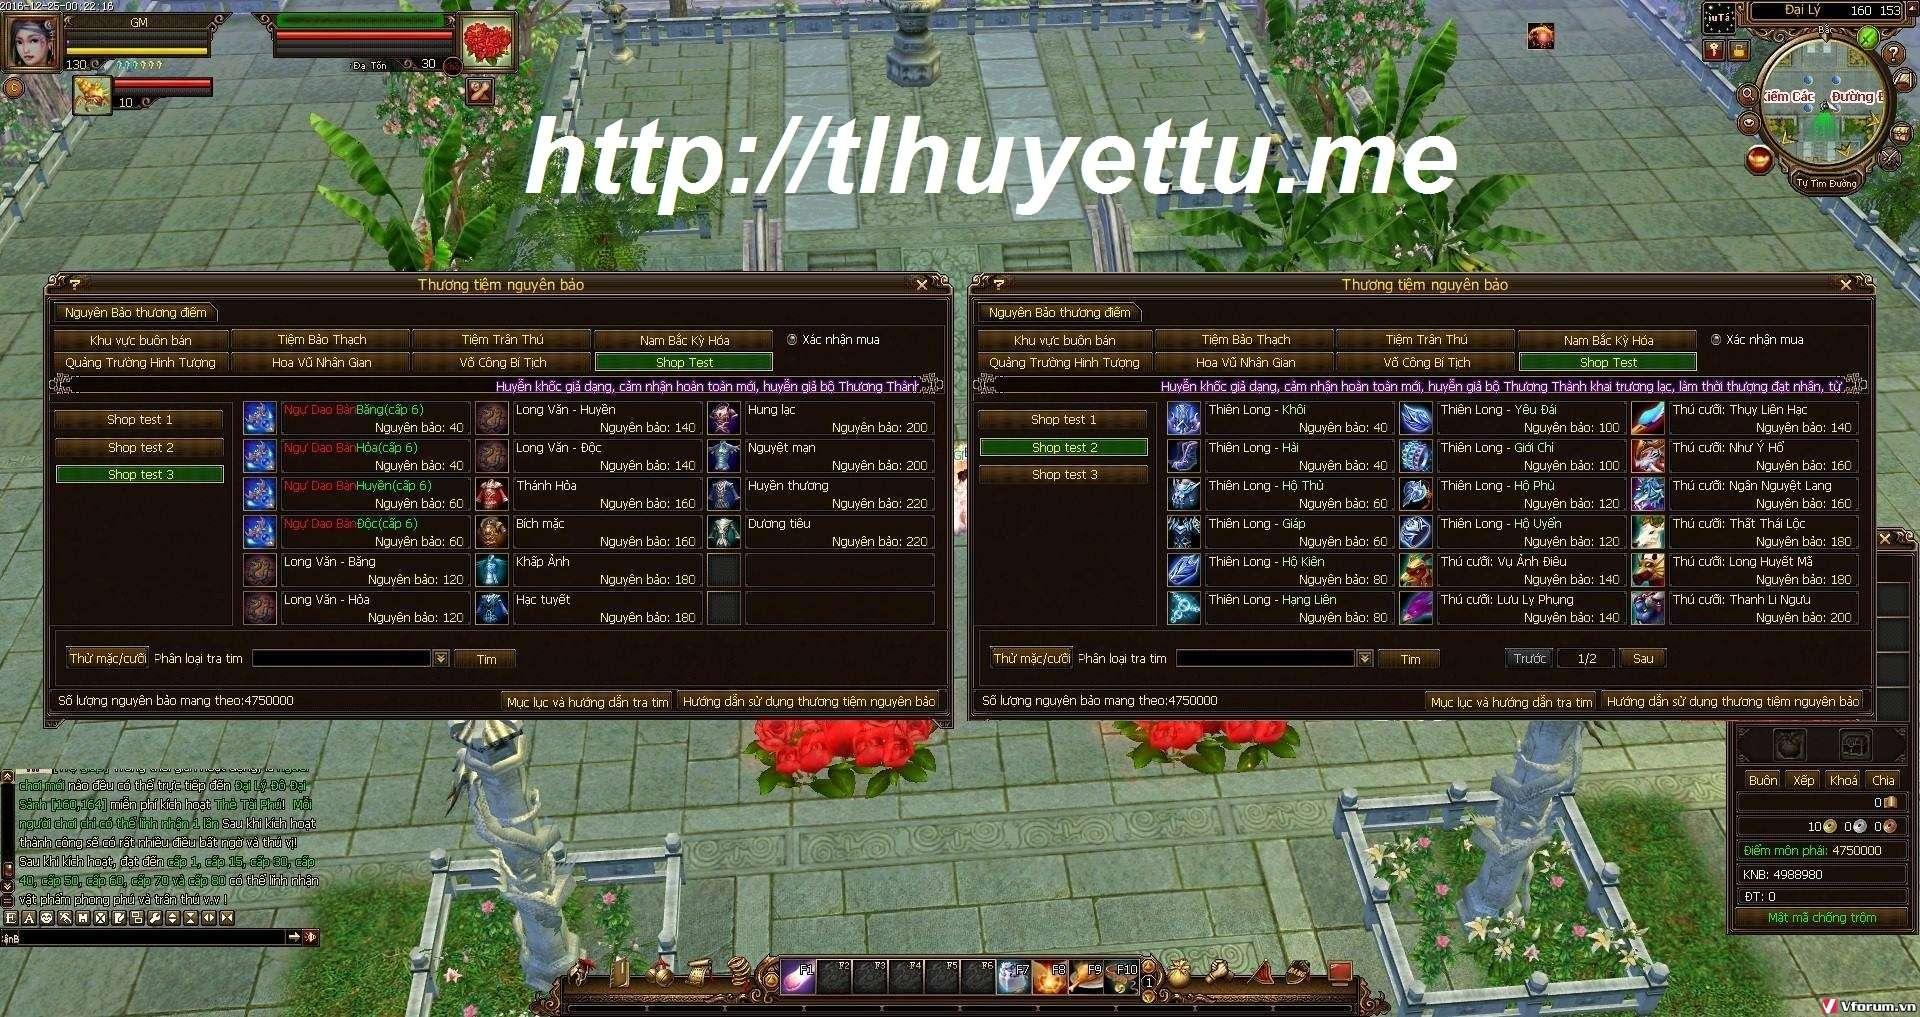 TL HUYẾT TỬ - Cs 3.0 MIỄN PHÍ - OPEN 19H30 T3 14/08 - SĂN TẤT CẢ, DMP, SET VIP - NHẬN